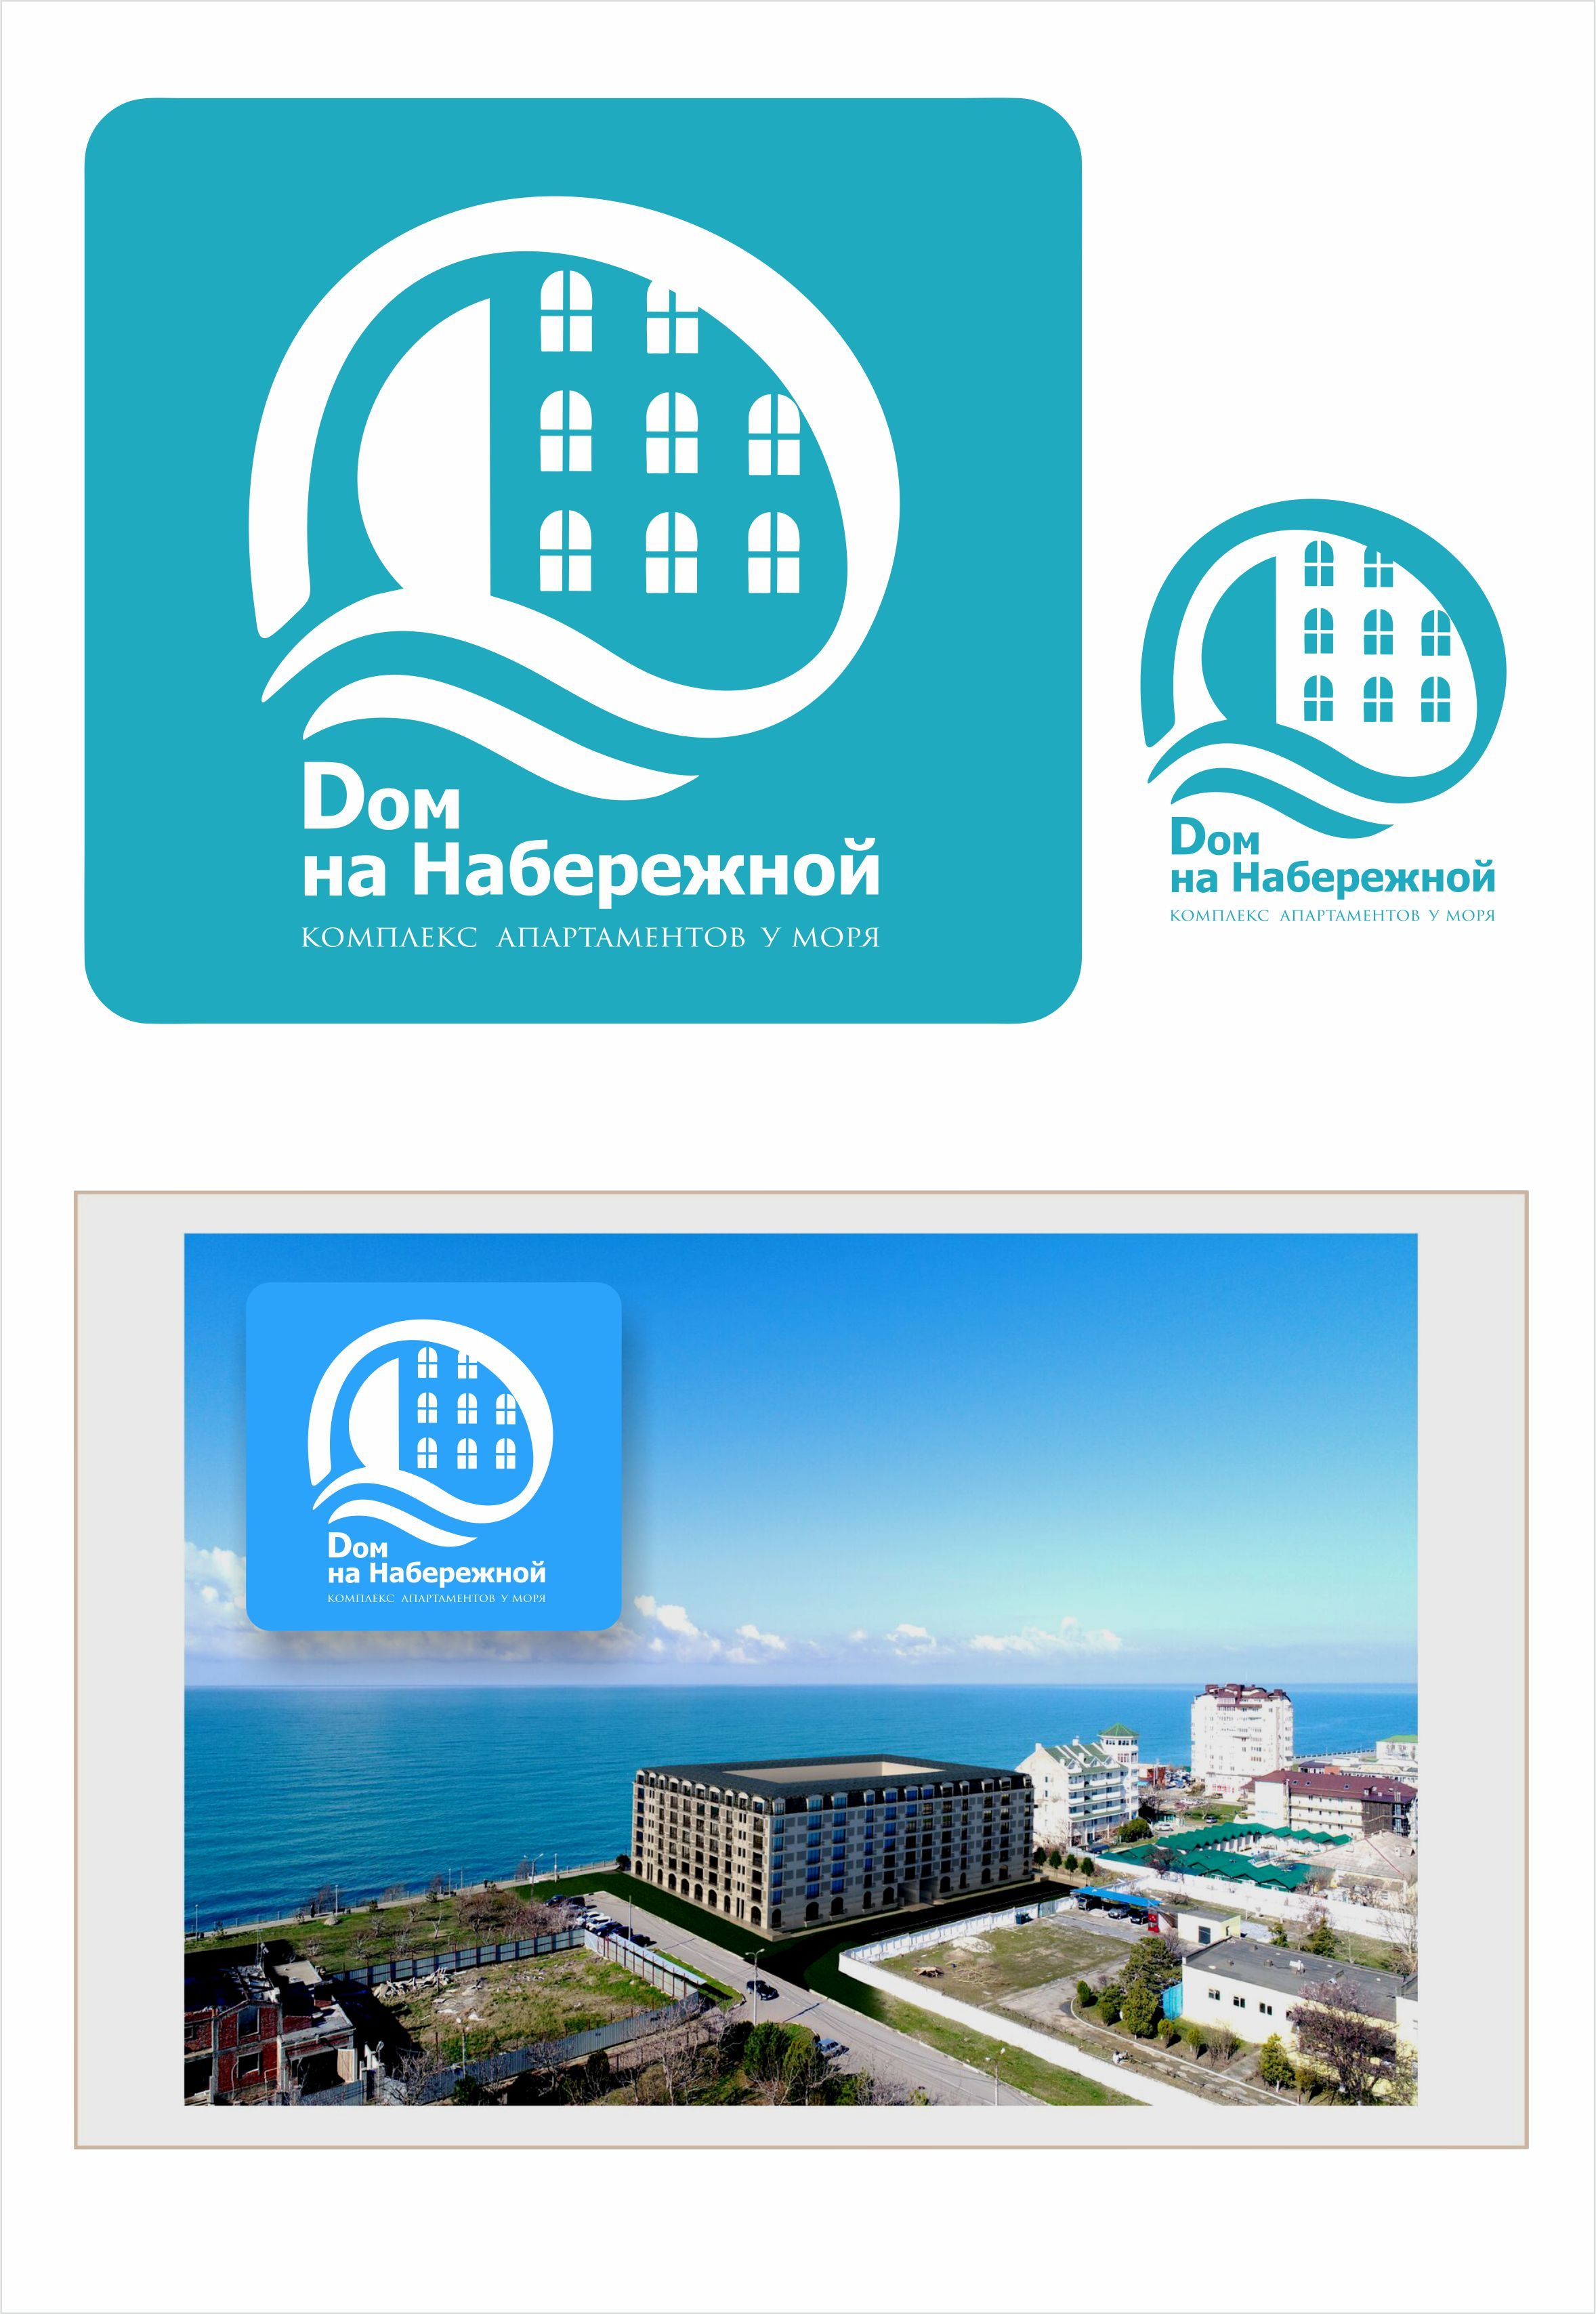 РАЗРАБОТКА логотипа для ЖИЛОГО КОМПЛЕКСА премиум В АНАПЕ.  фото f_8385de78e044c6a9.jpg